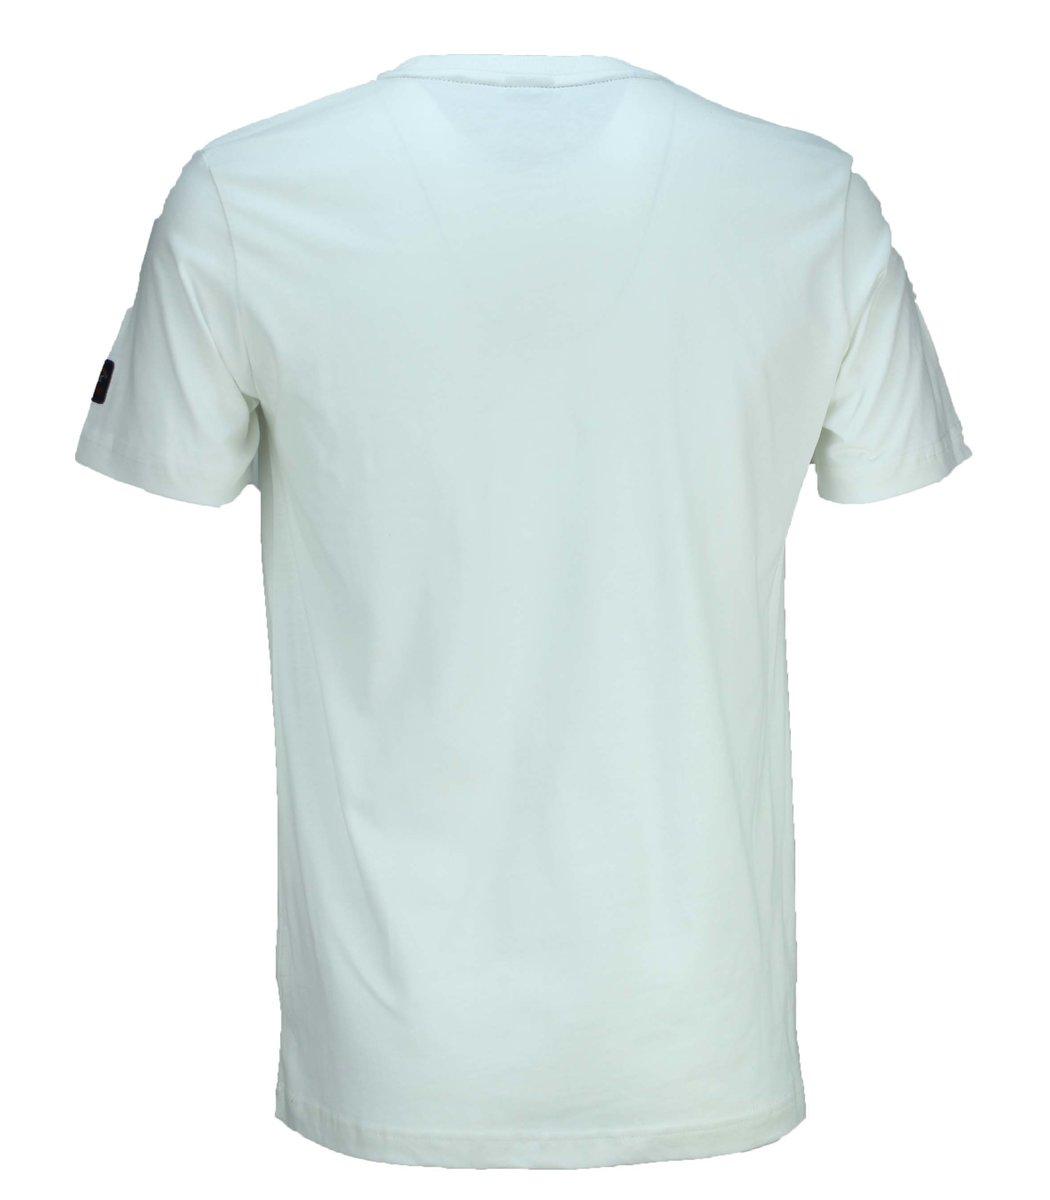 Белая футболка Paul&Shark с вышивкой FP5